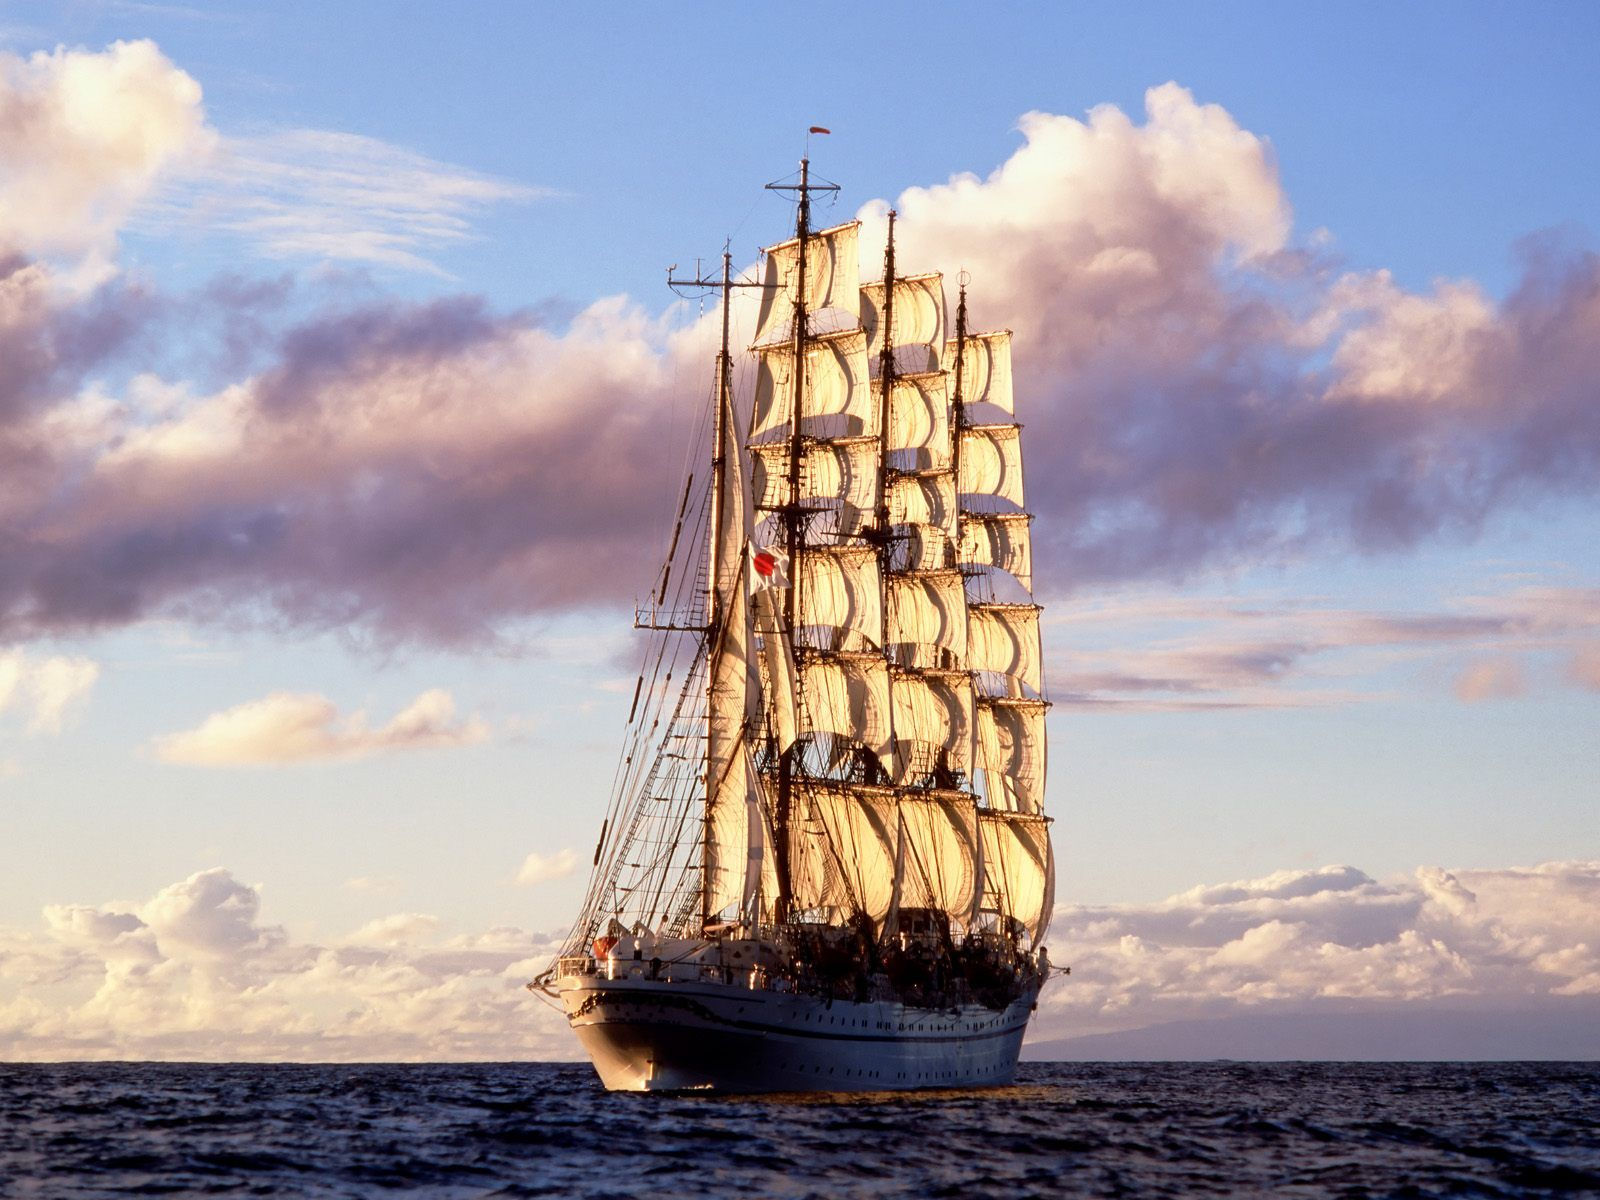 desktop wallpaper MusicMatica Ships Vehicles 72579 1600x1200